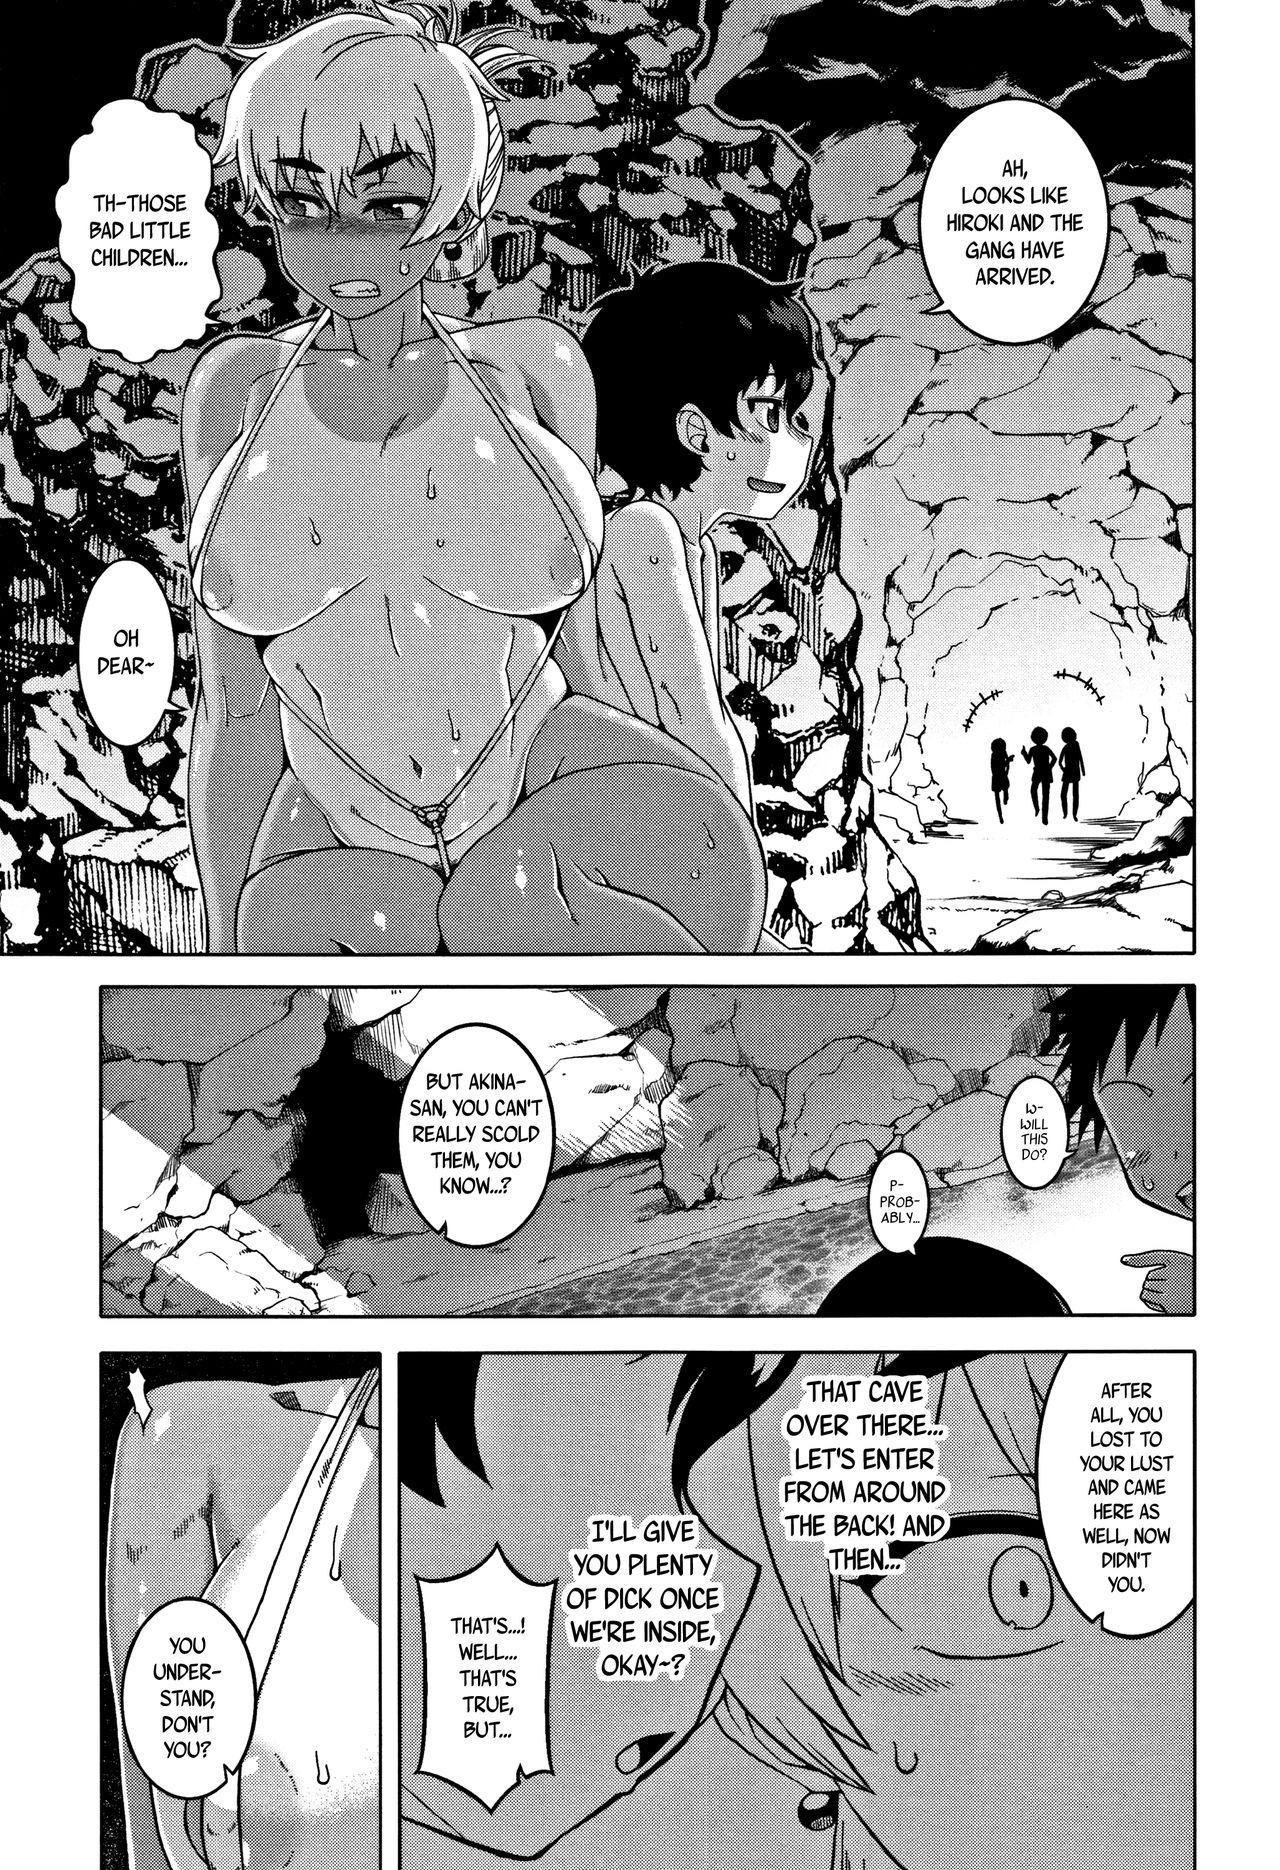 [Takatsu] Hitozuma A-san to Musuko no Yuujin N-kun - Married wife A and son's friend N-kun [English] 59